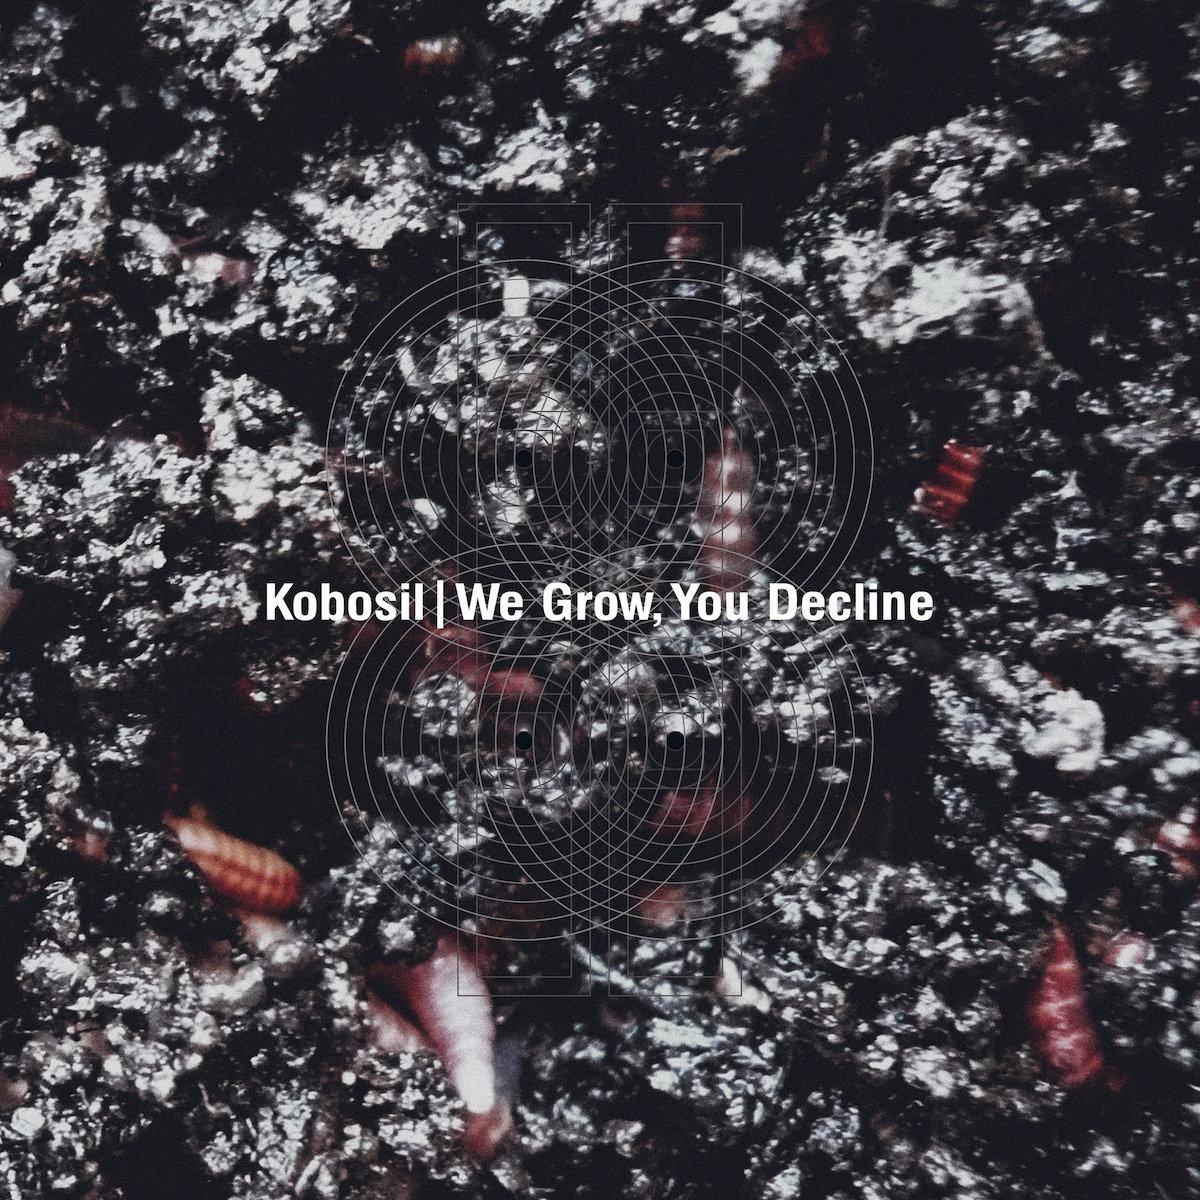 Album of the week: Kobosil – We Grow, You Decline